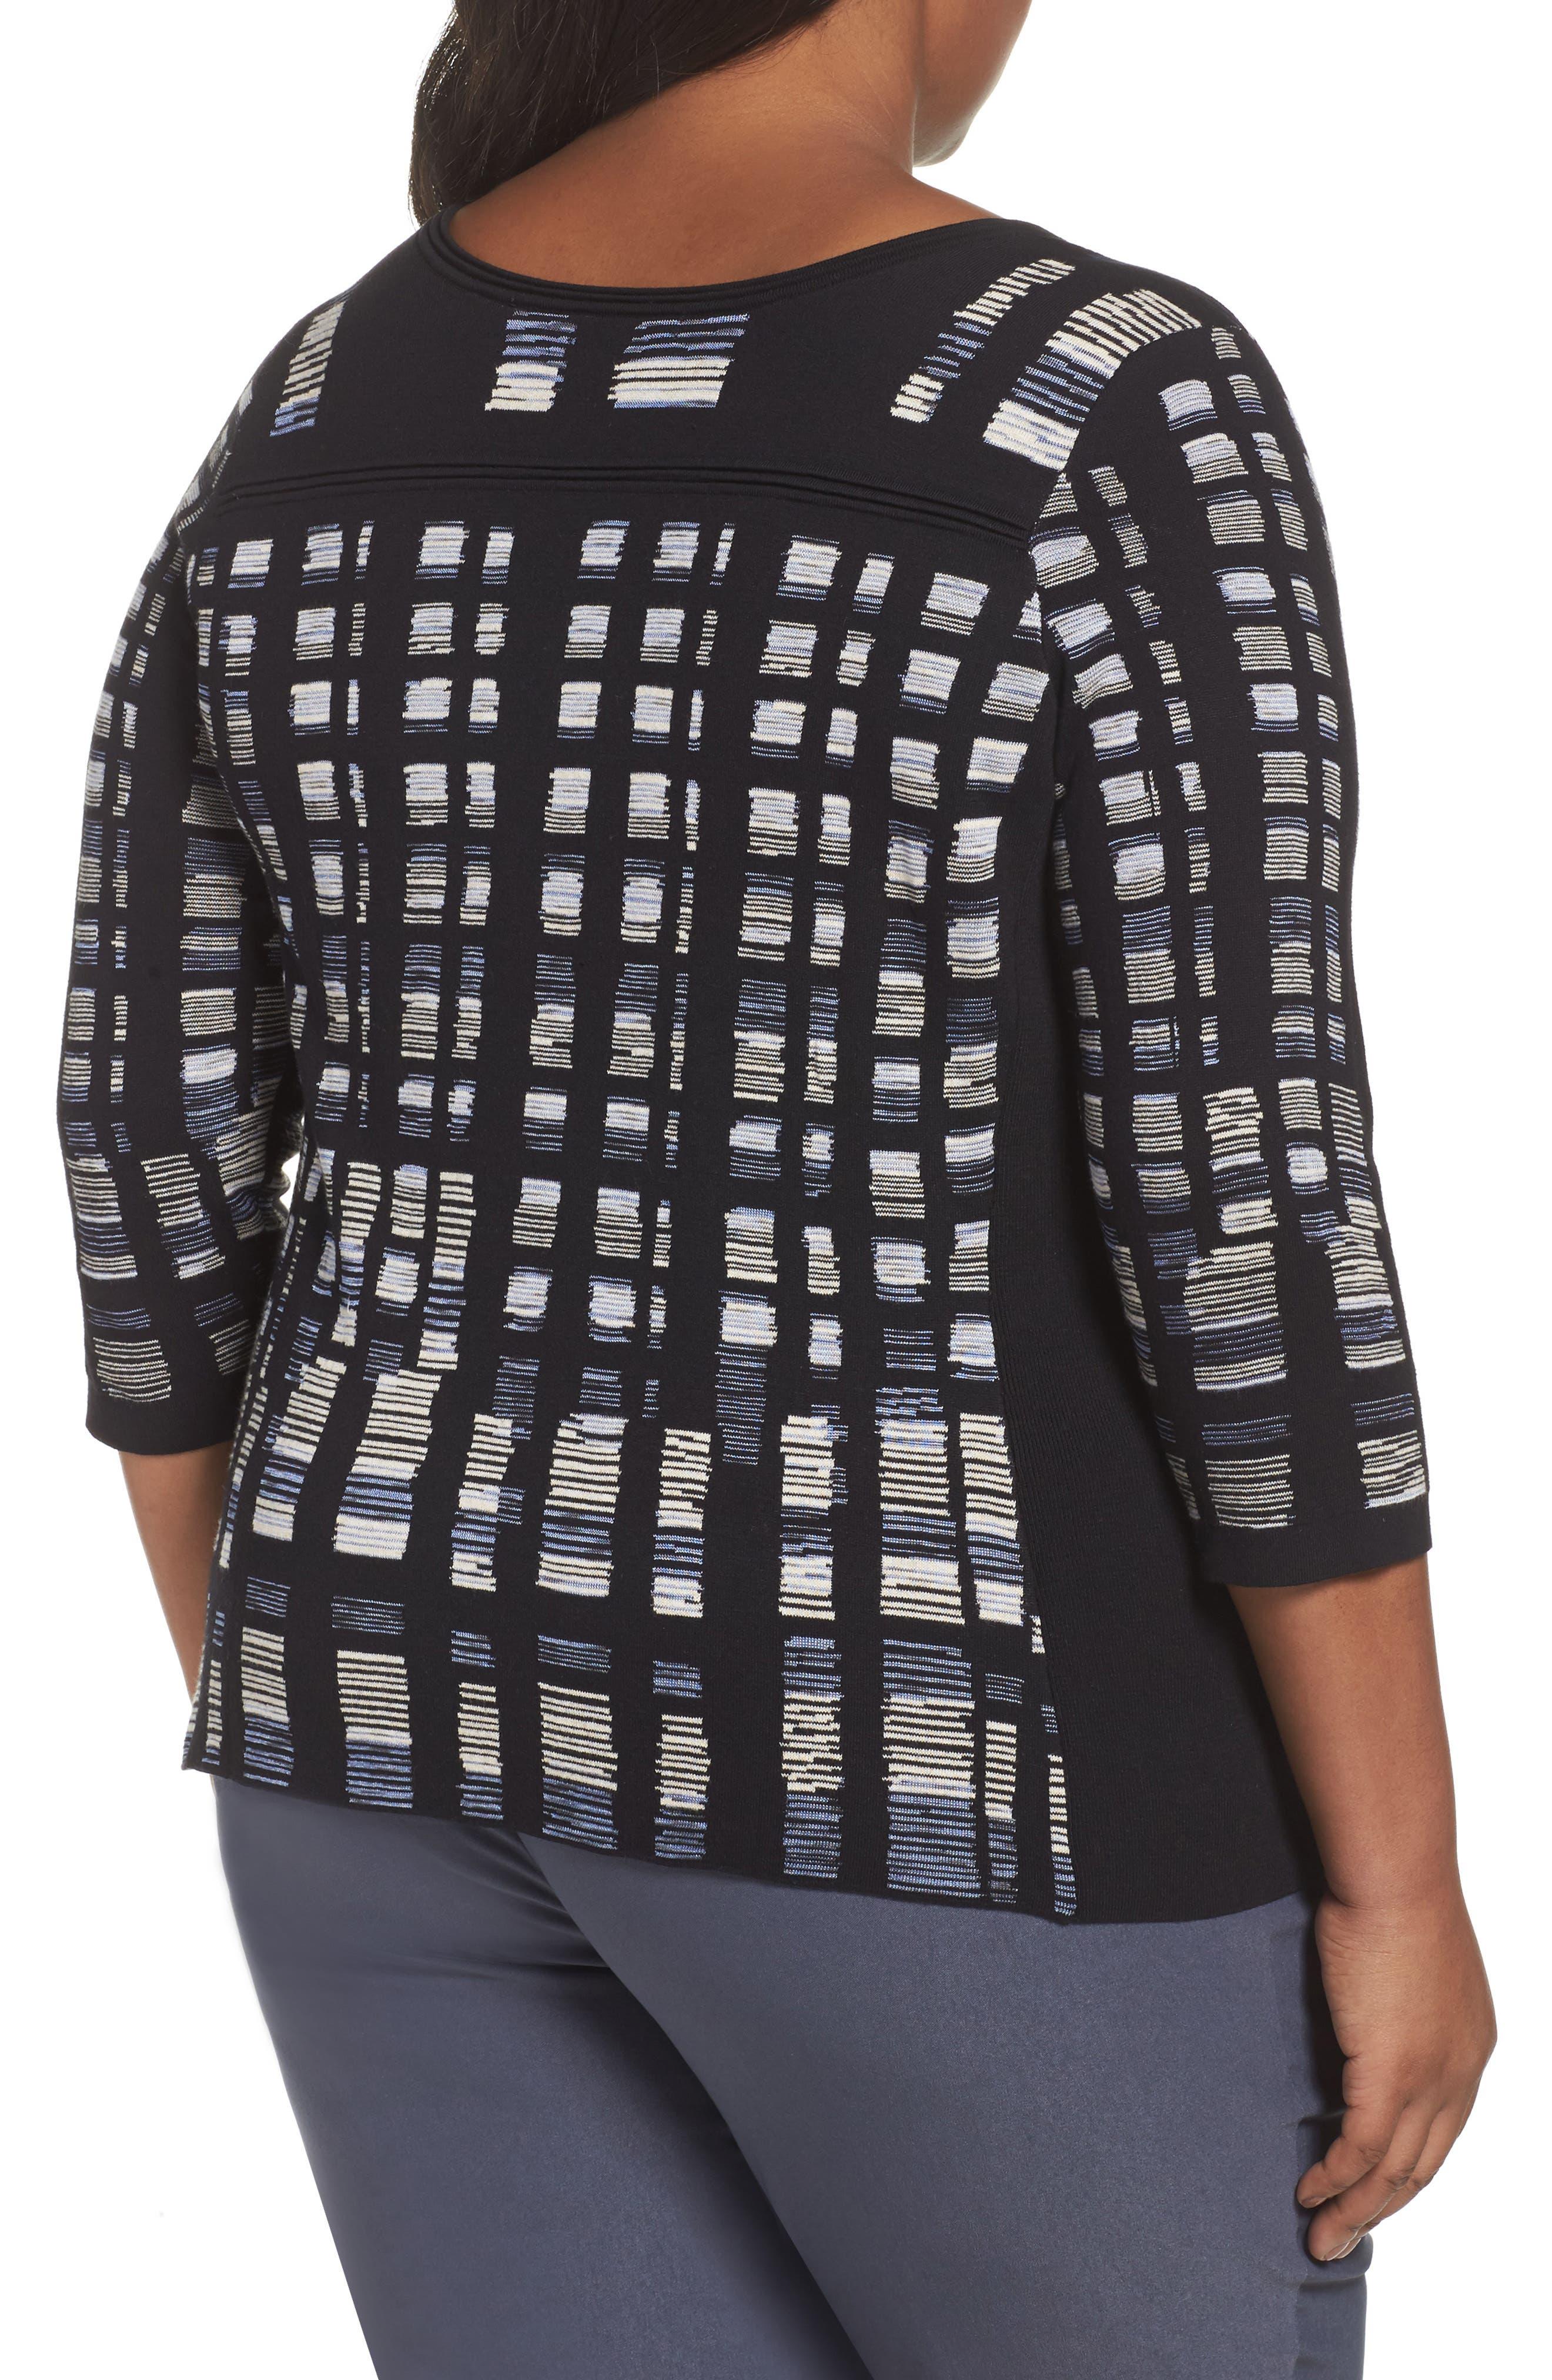 Crystal Cove Sweater,                             Alternate thumbnail 2, color,                             Black Multi